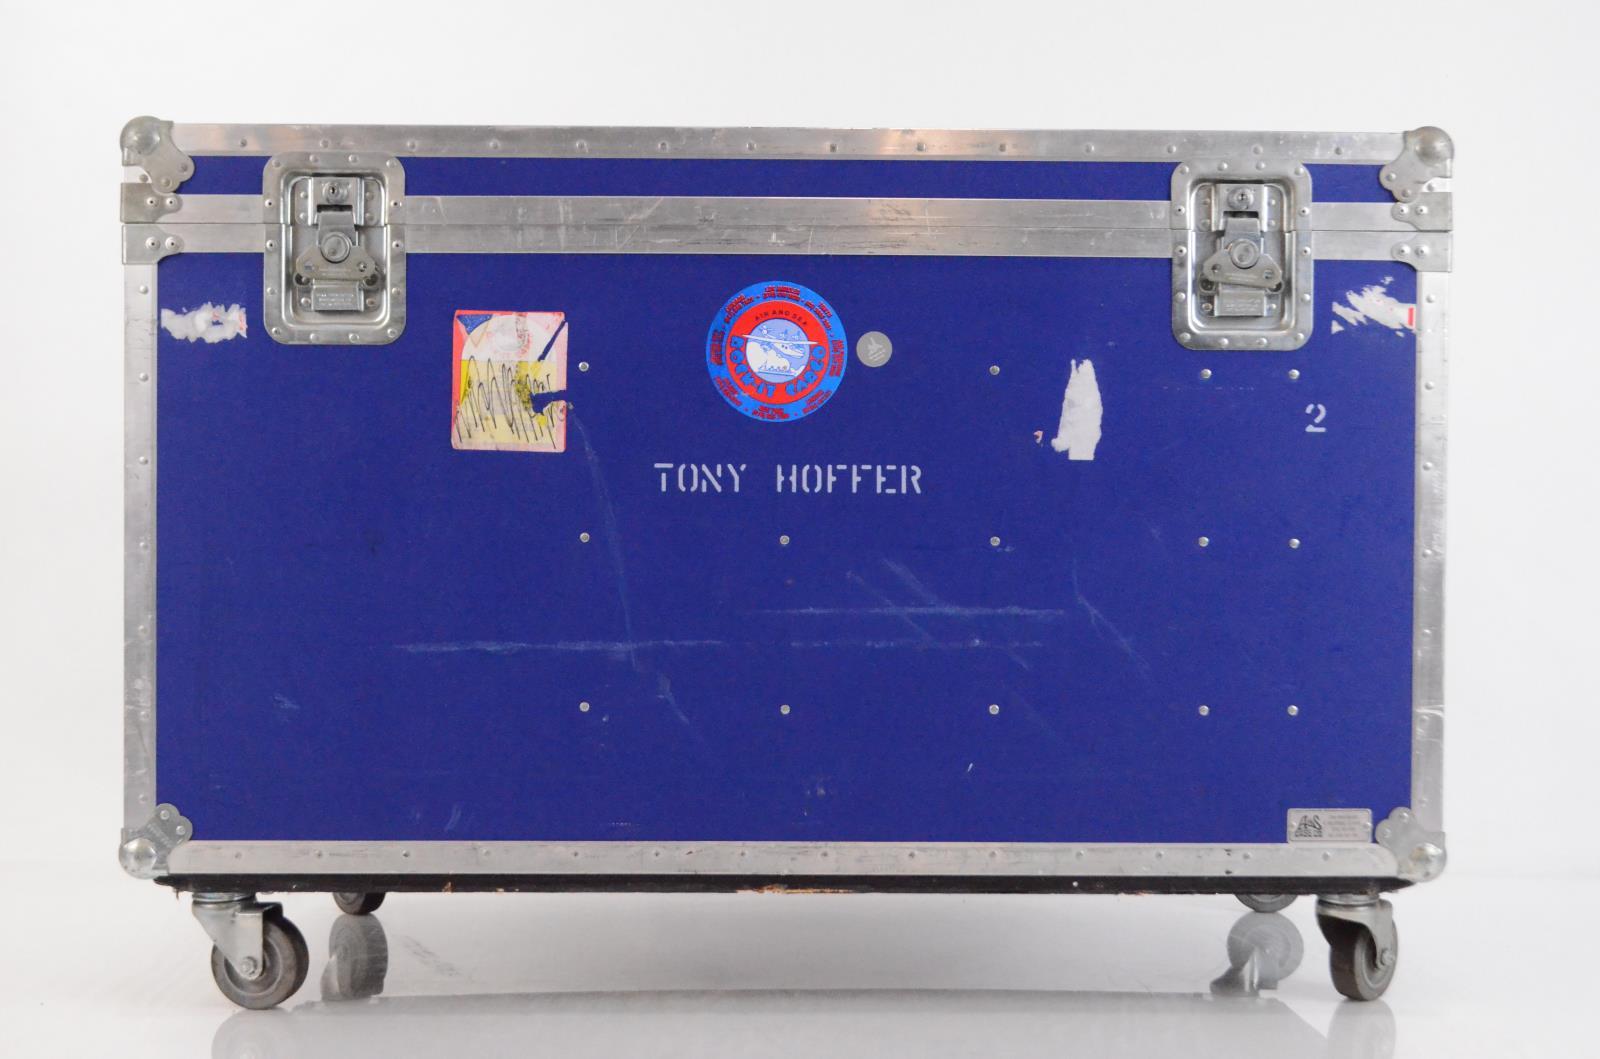 A&S Audio Video Accessory Rolling Trunk ATA Flight Road Case w/ Wheels #33910